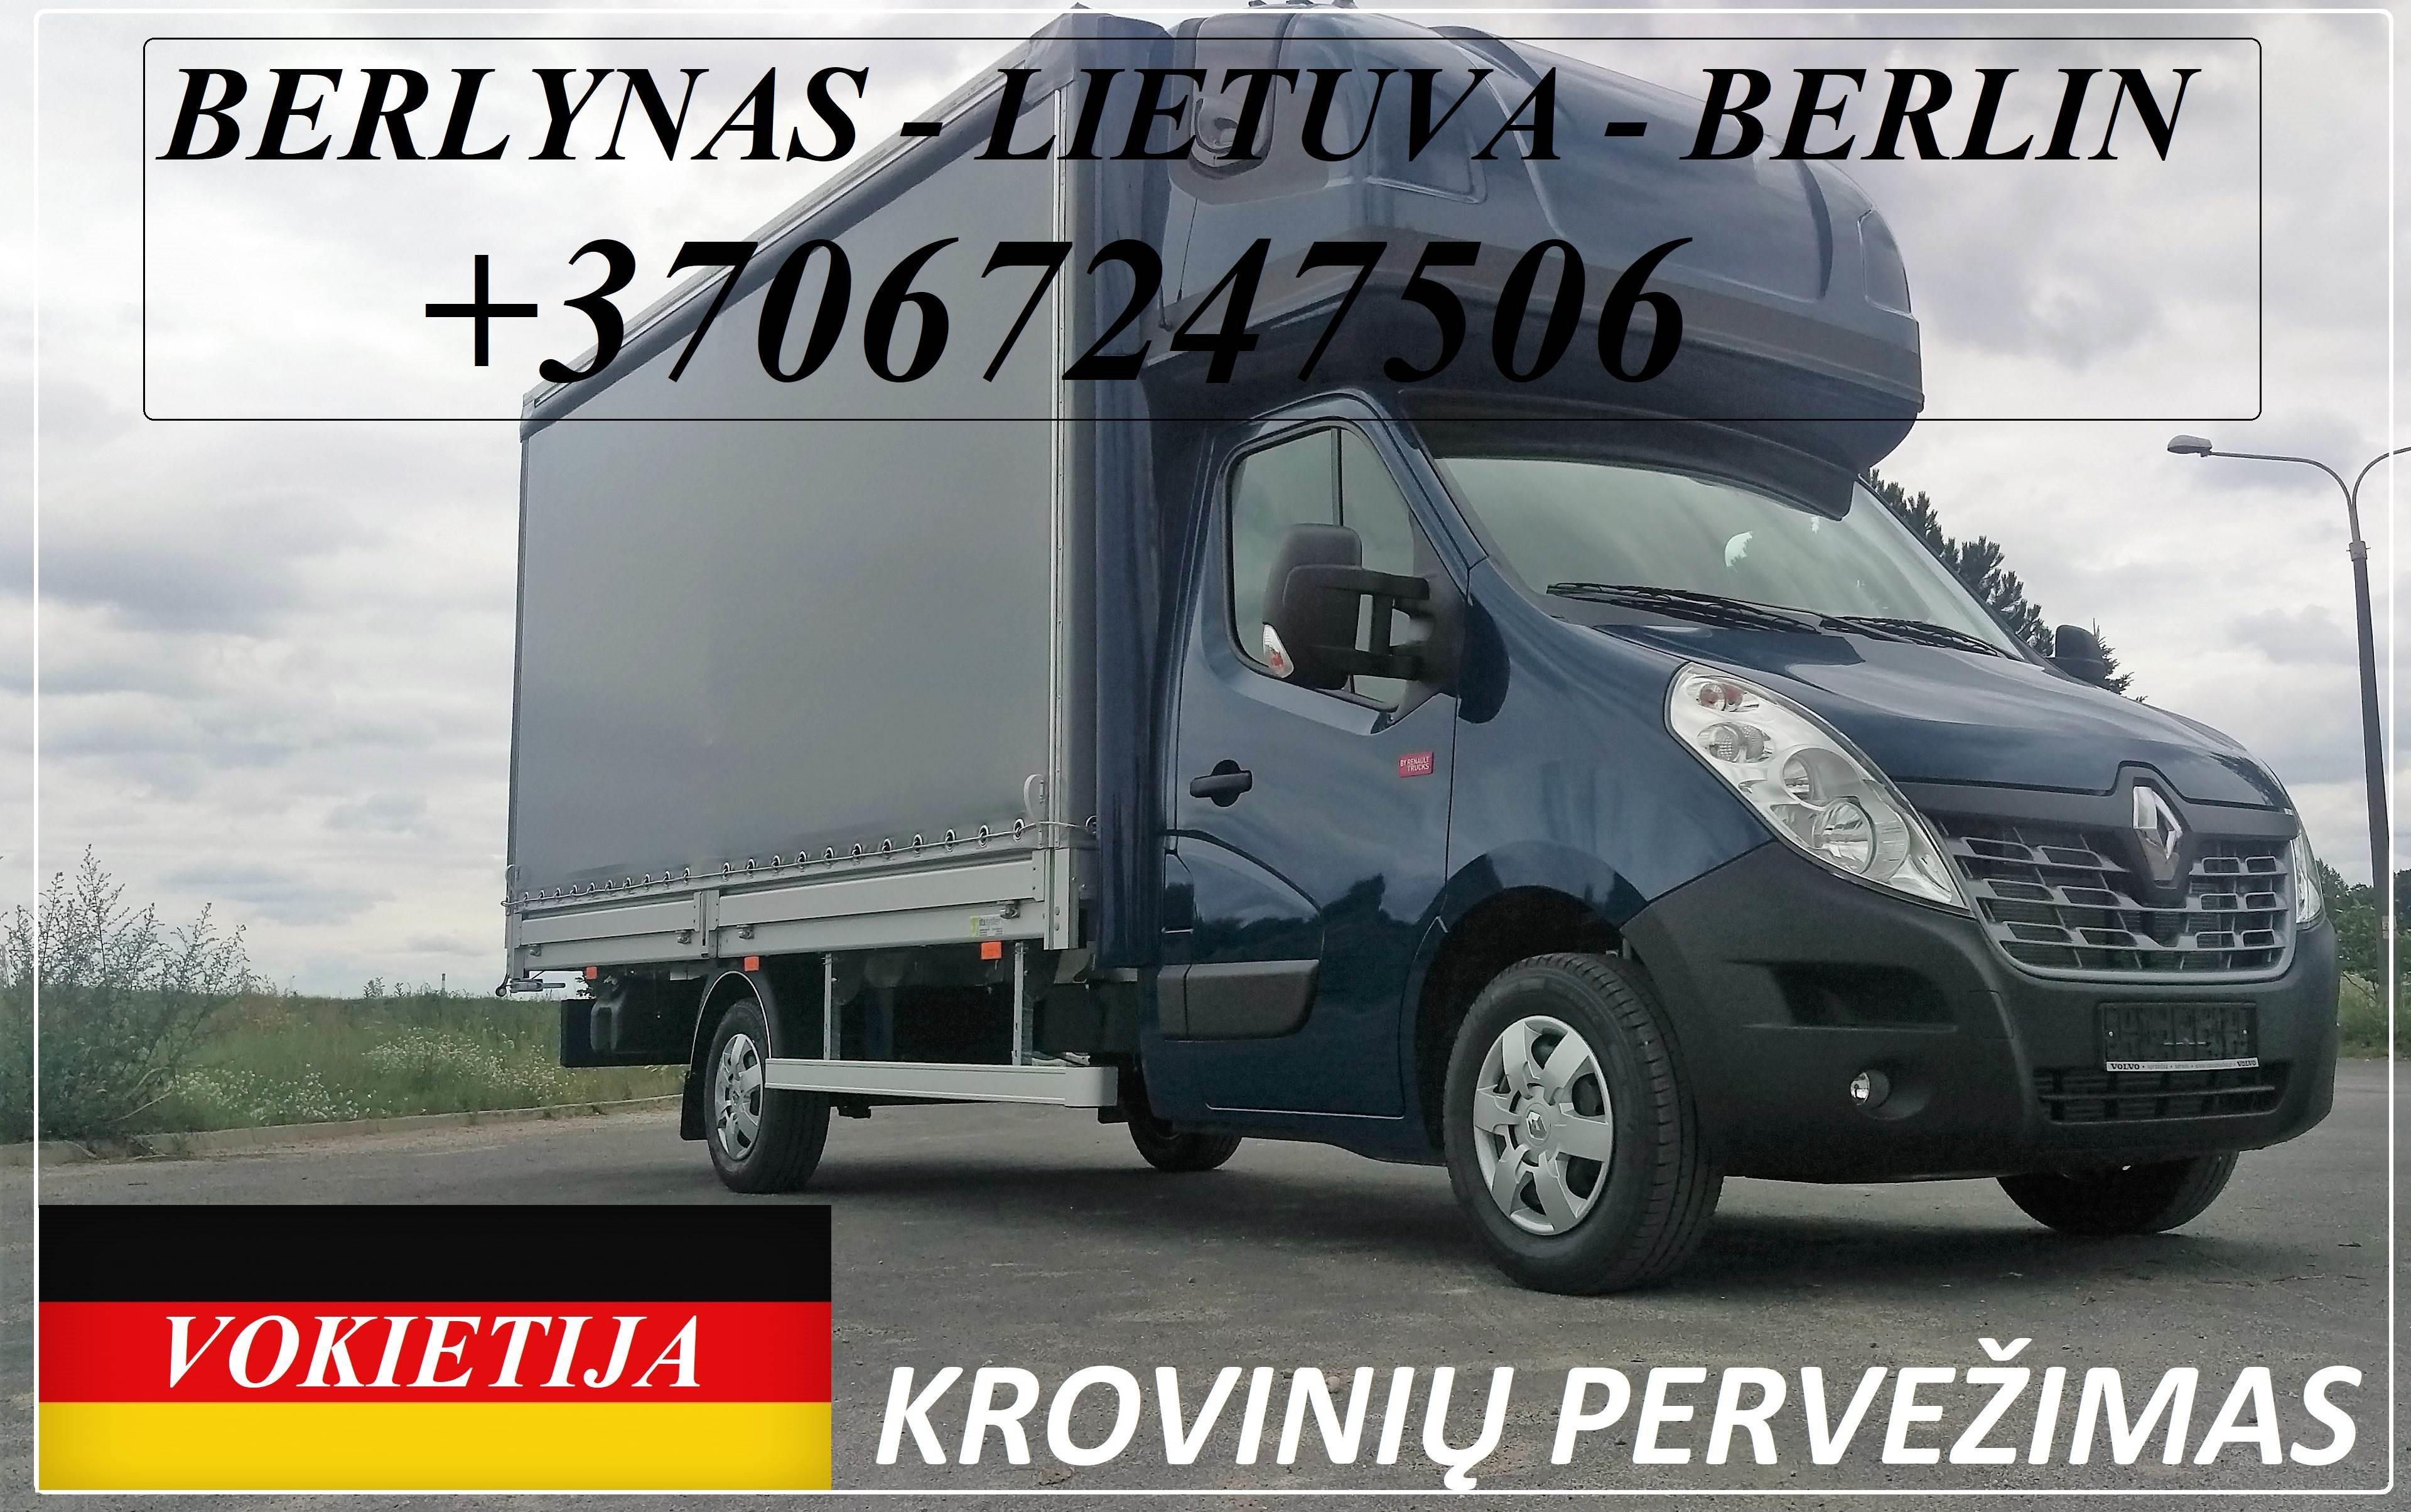 Berlynas - Lietuva - Berlin !  transporto paslaugas Lietuva - Vokietija / Germany - Lietuva